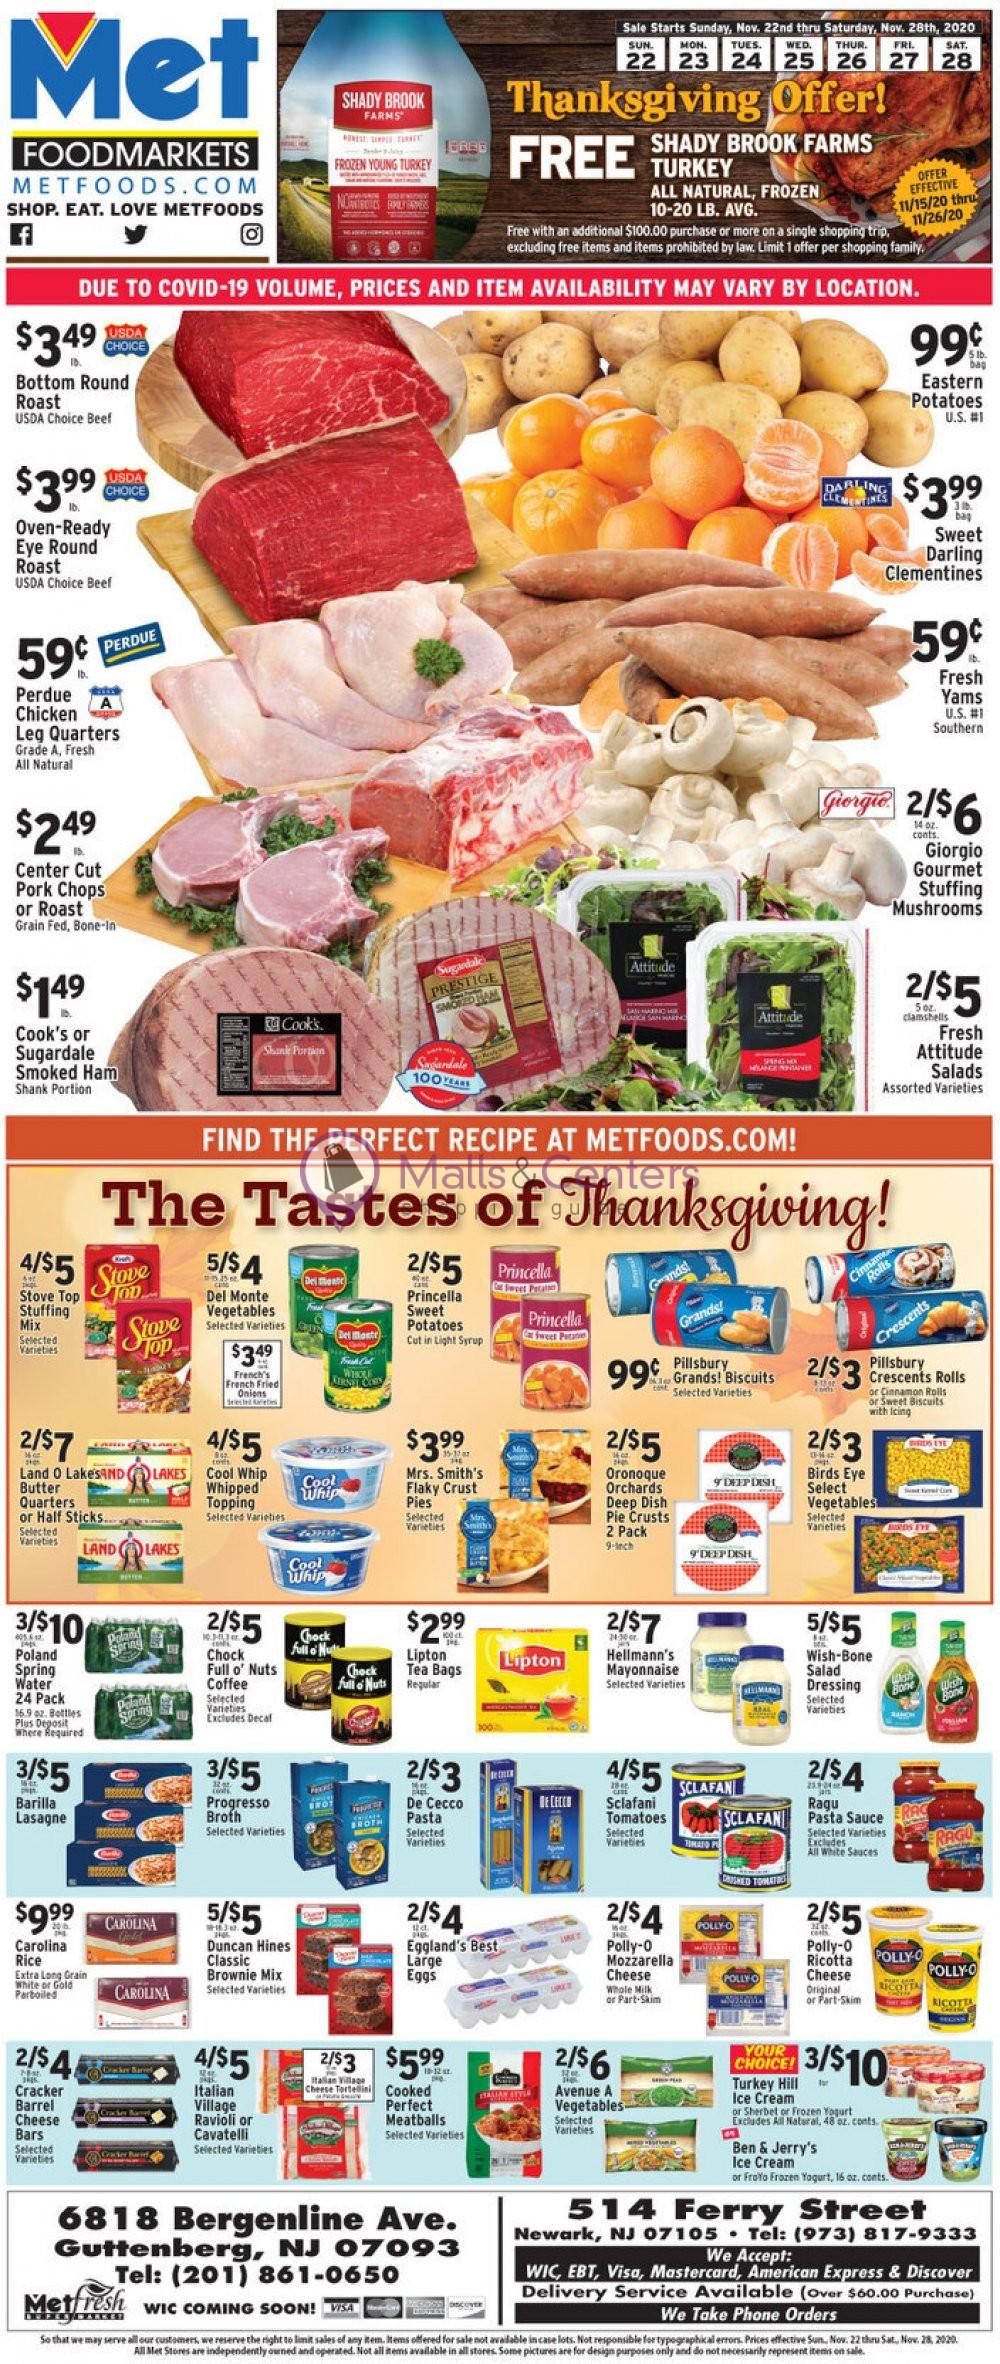 weekly ads Met Foodmarkets - page 1 - mallscenters.com